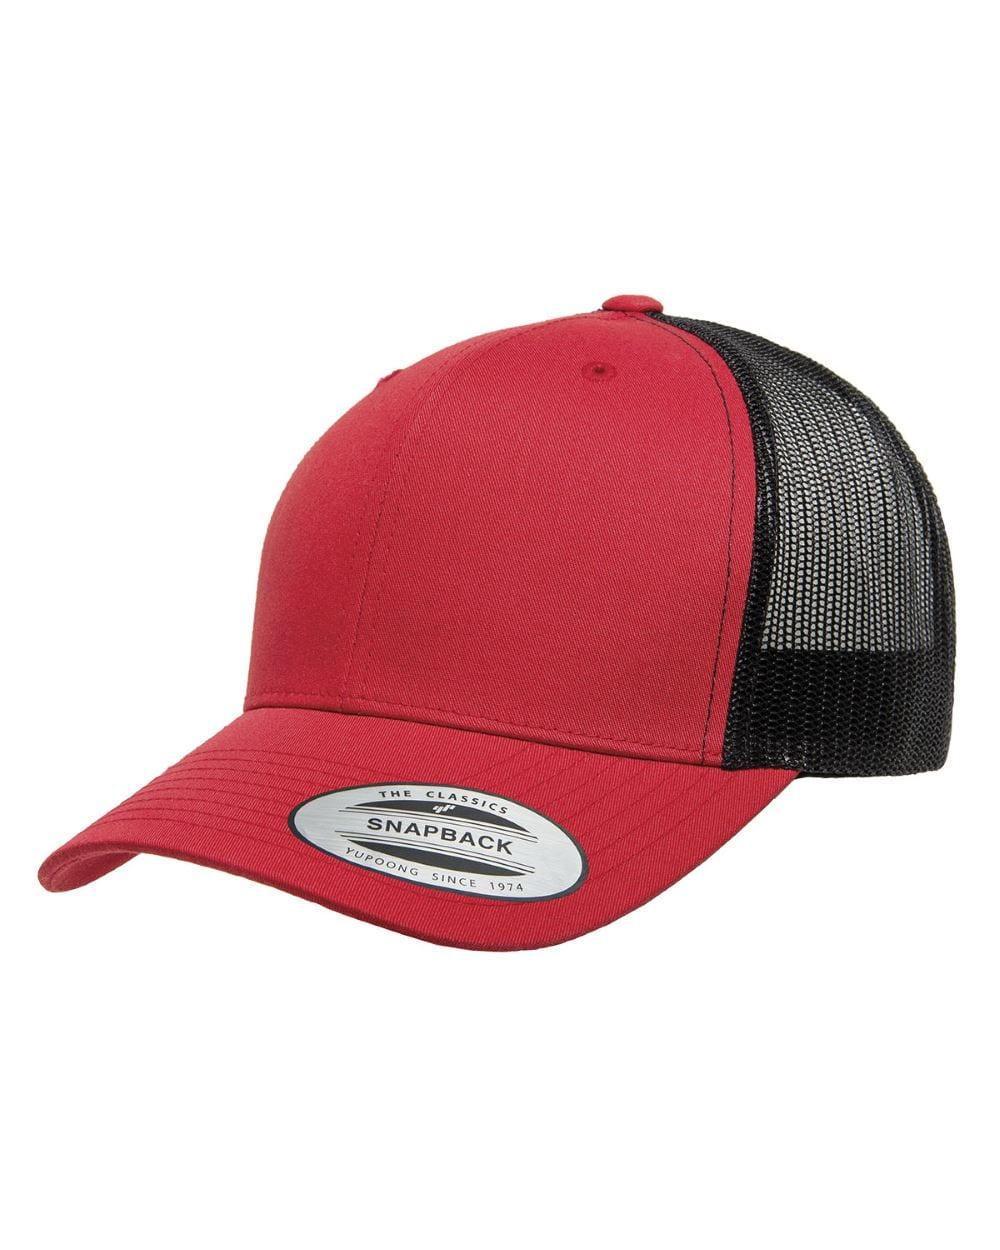 ac7206fd801f8 bulk custom shirts - custom hats yupoong 6606 custom retro trucker snapback  cap red black